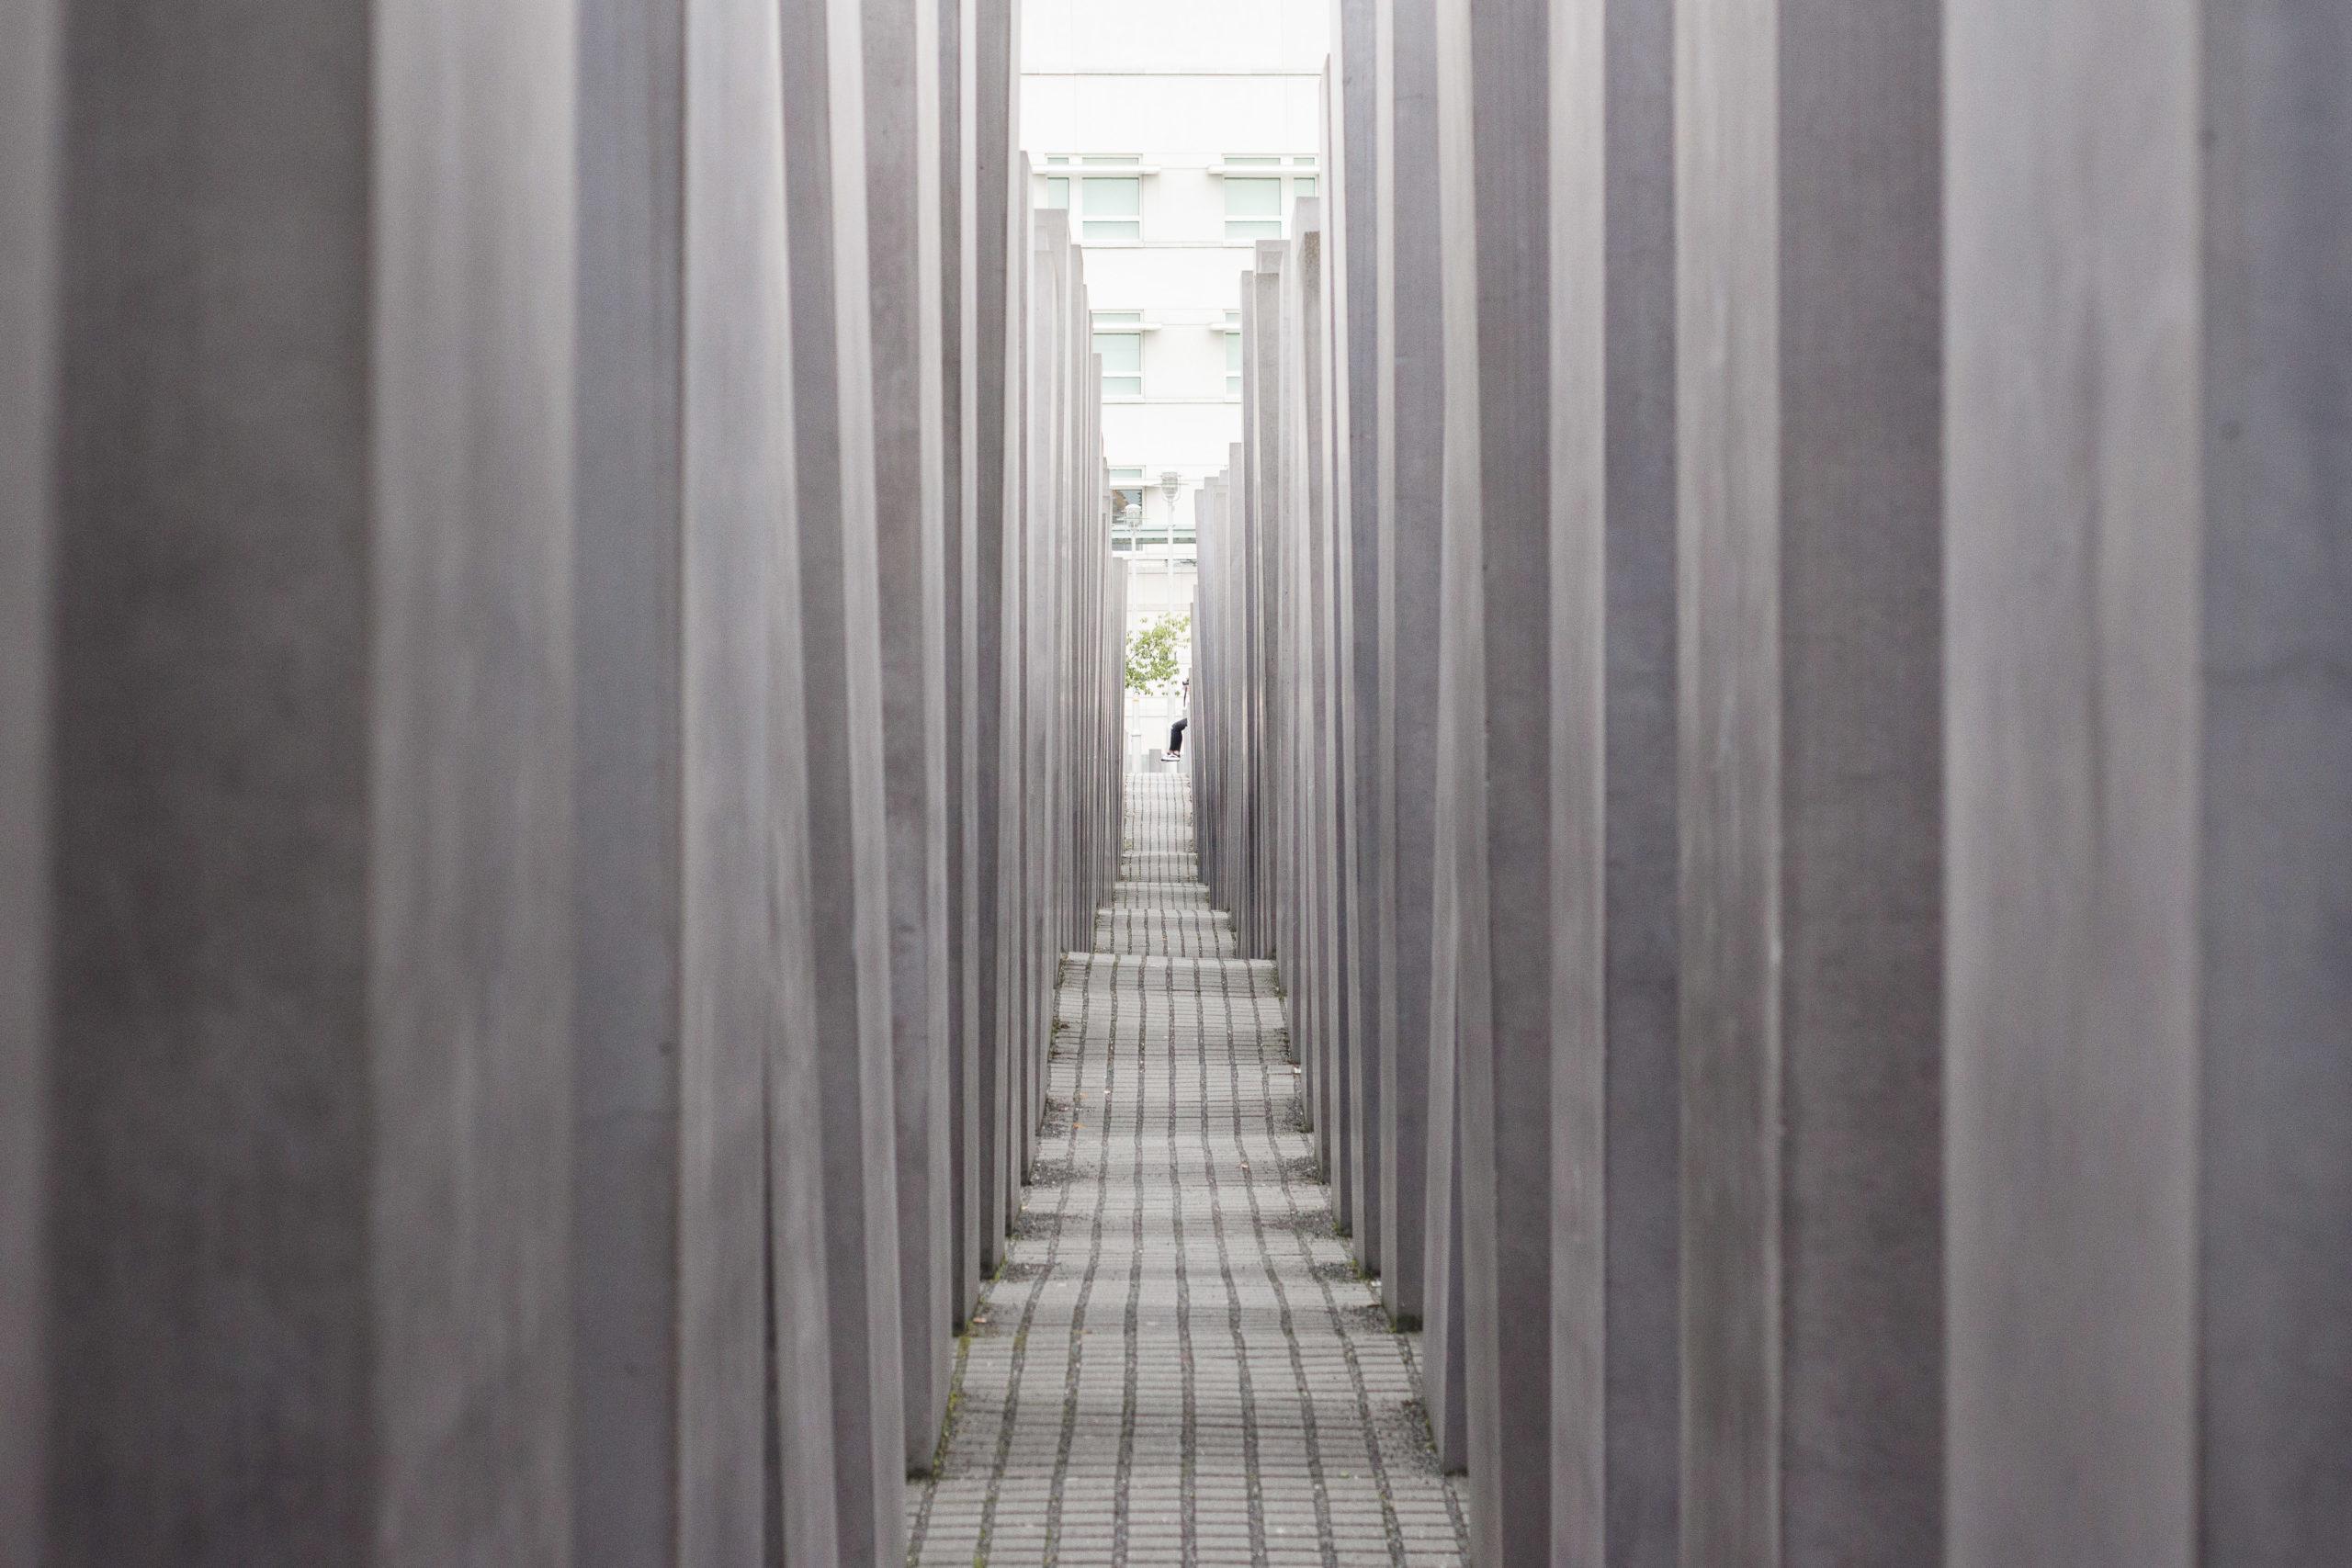 Somewhere in Berlin14